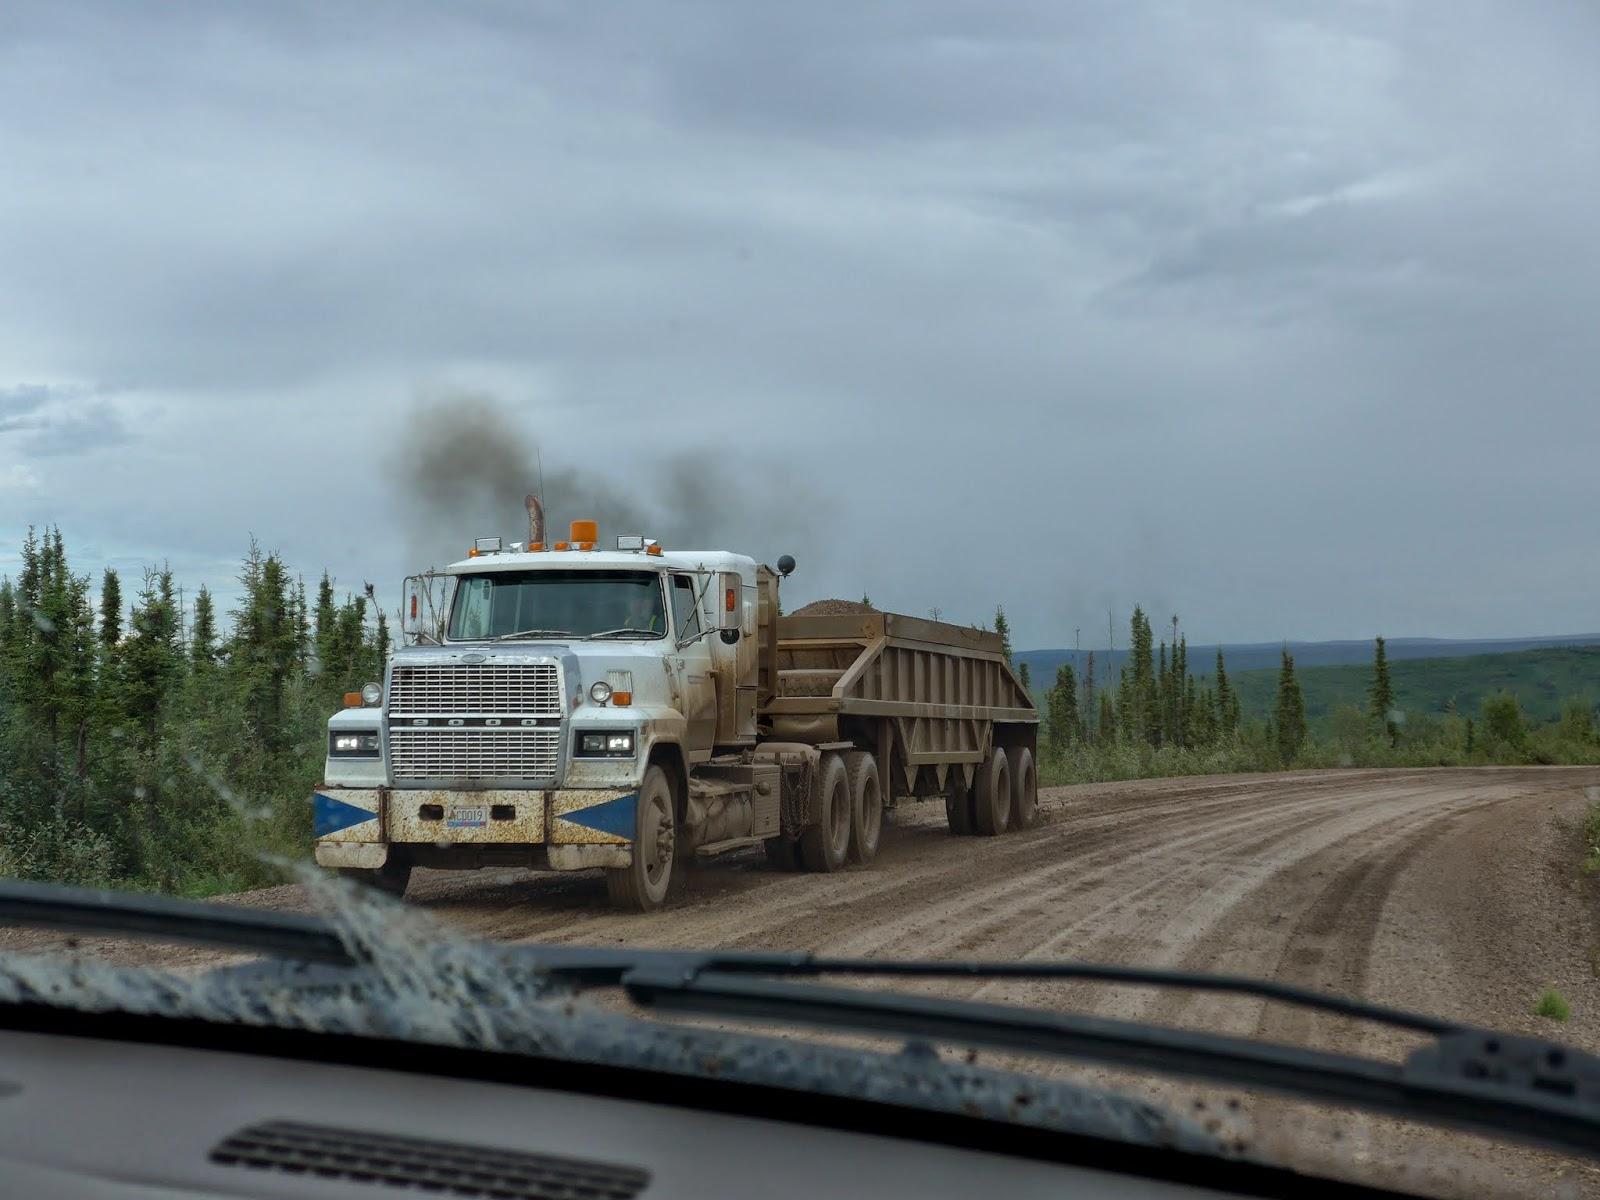 Semi truck hauling gravel.